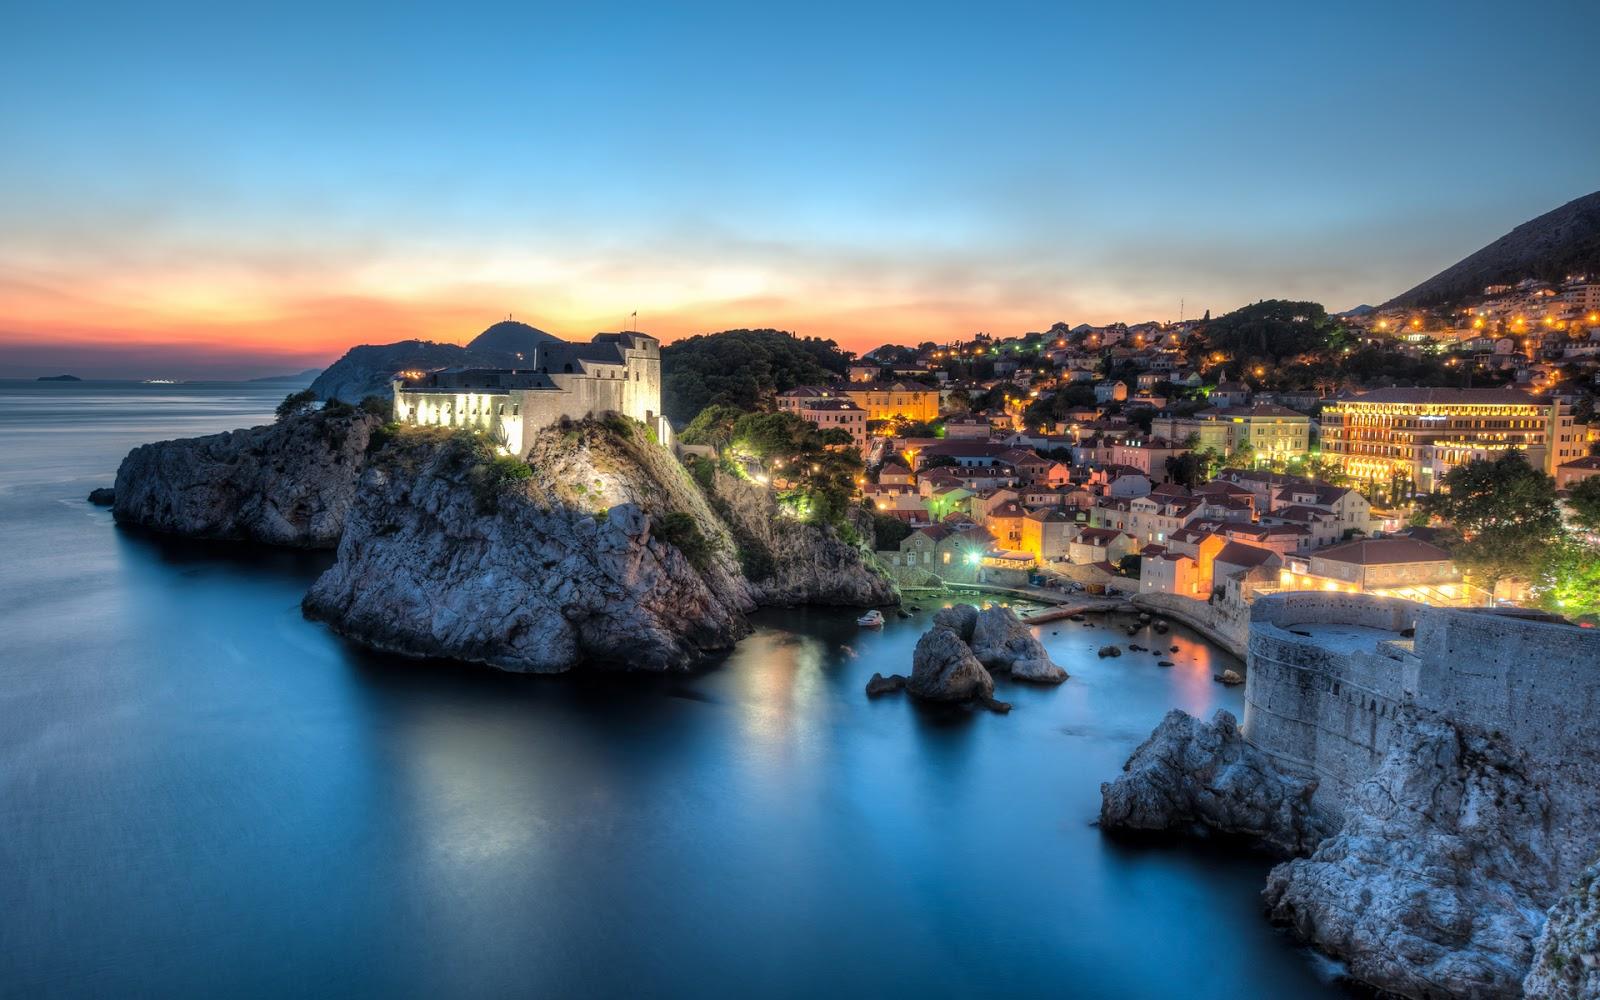 http://1.bp.blogspot.com/-XLKRr1mbu1o/UIa0JJLtPkI/AAAAAAAAE5w/dg8cBawJ7s0/s1600/croatia.jpg